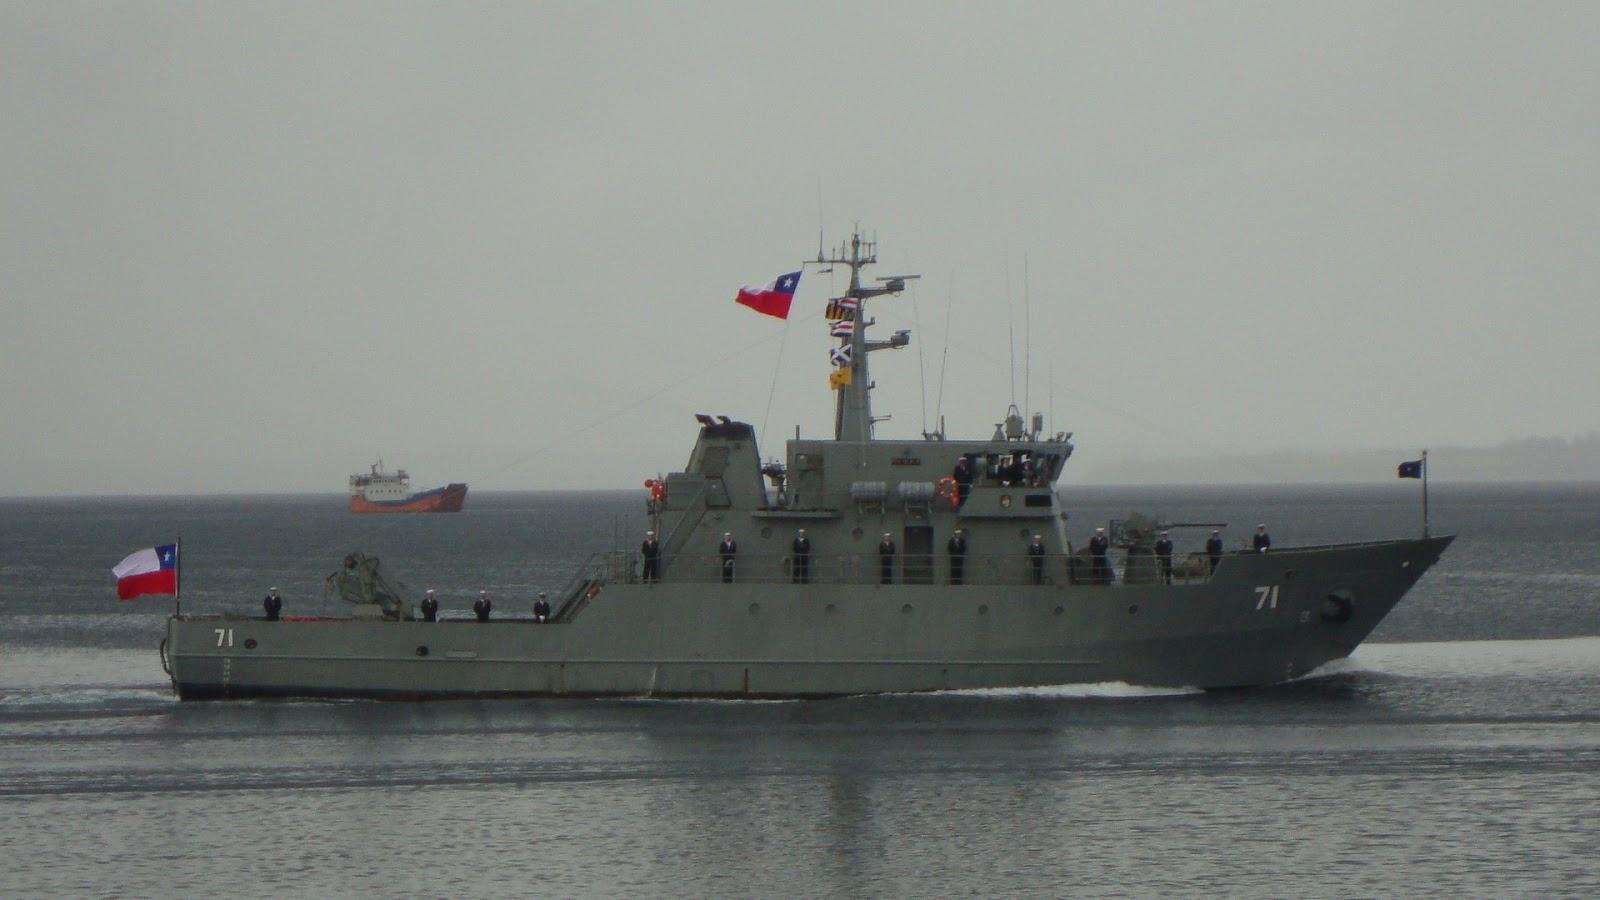 Fuerzas Armadas de Chile MICALVI